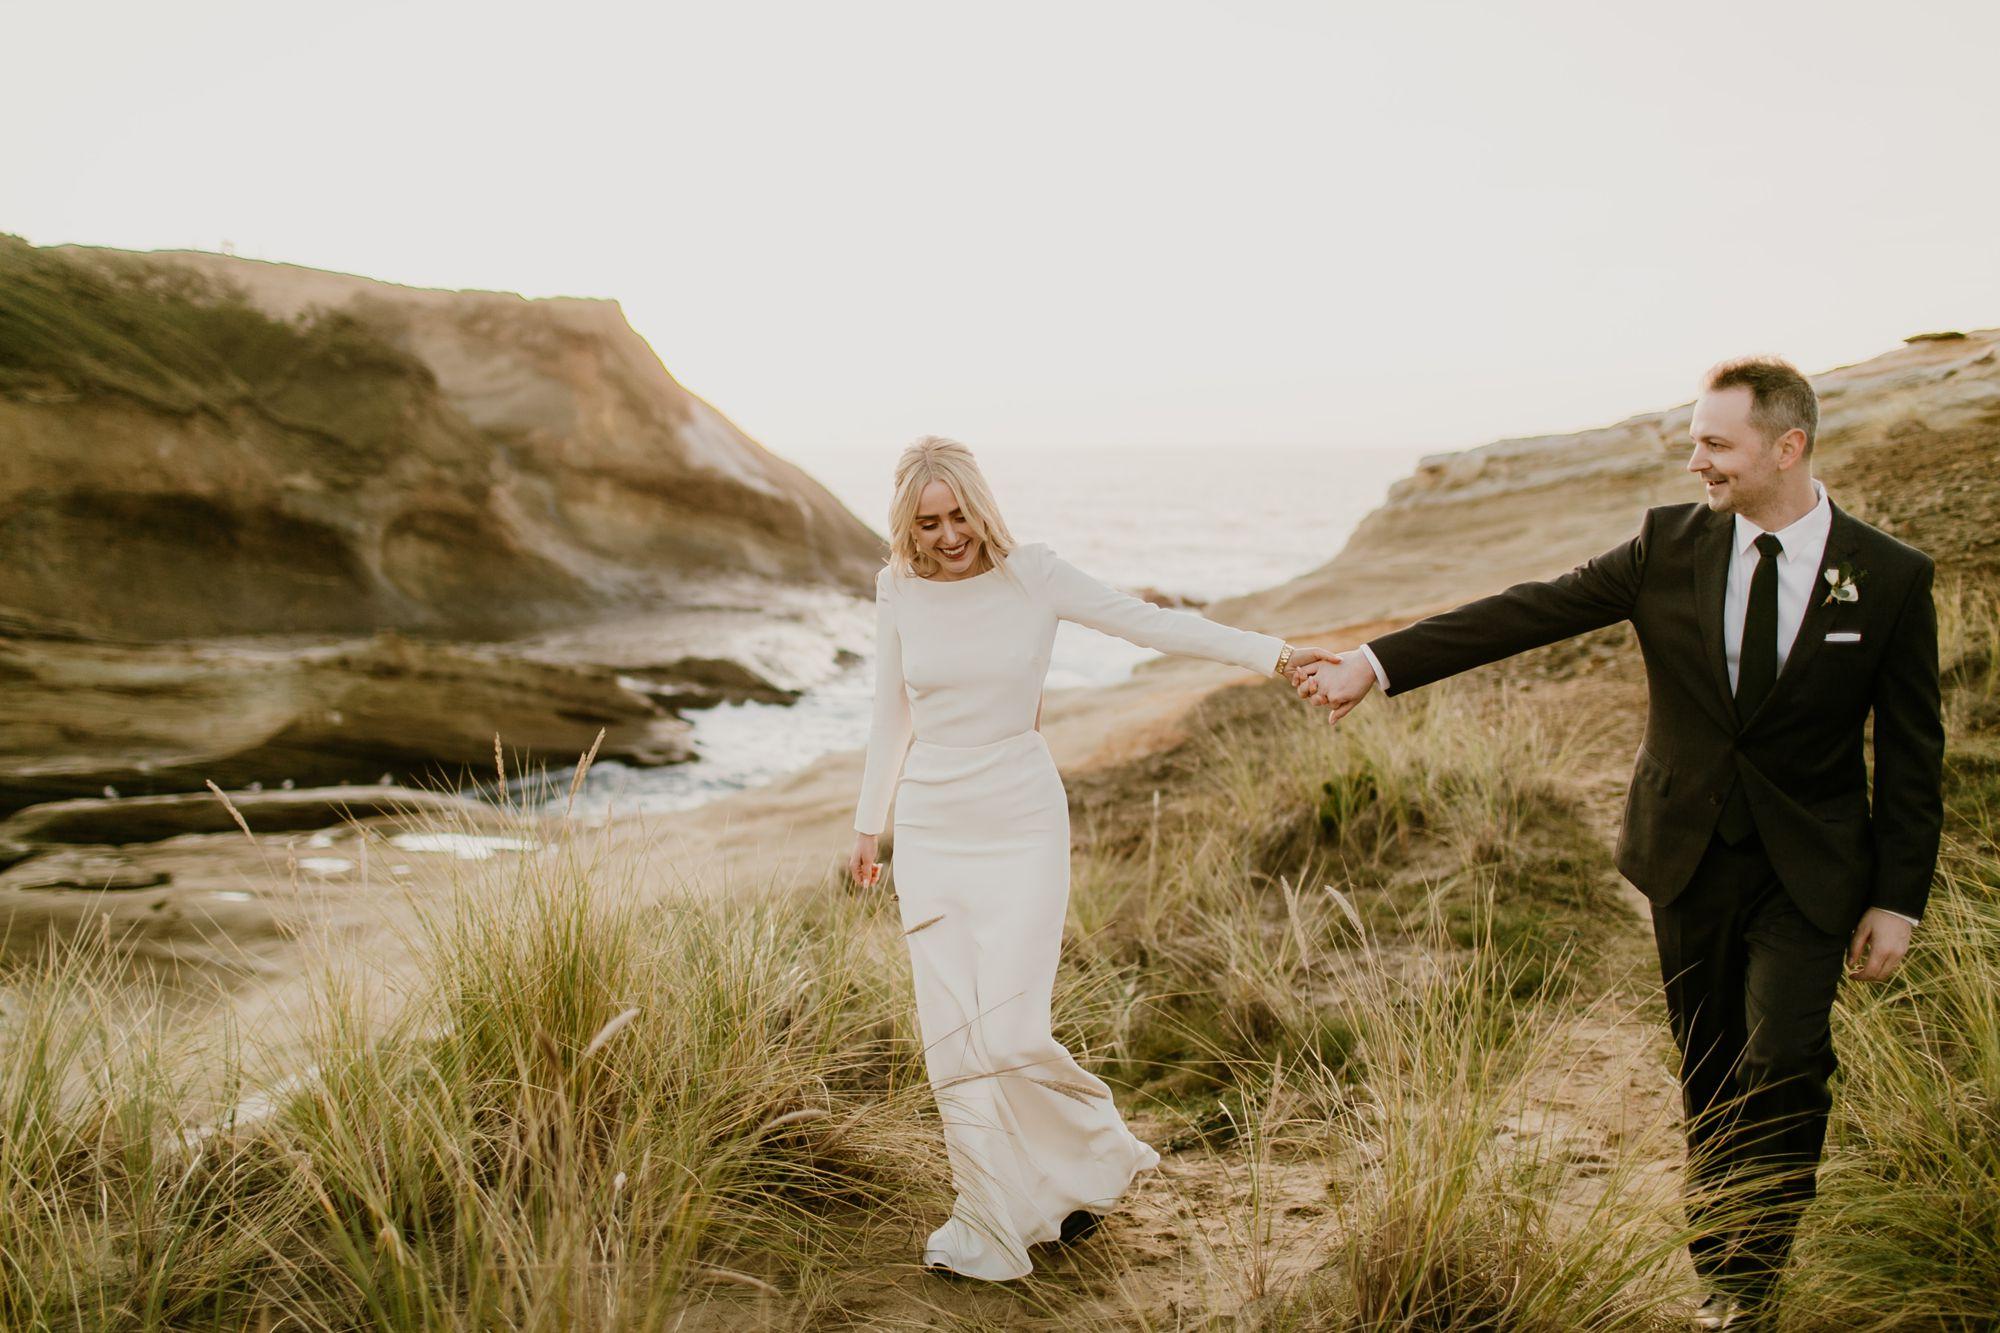 Celebrating their Oregon Coast elopement